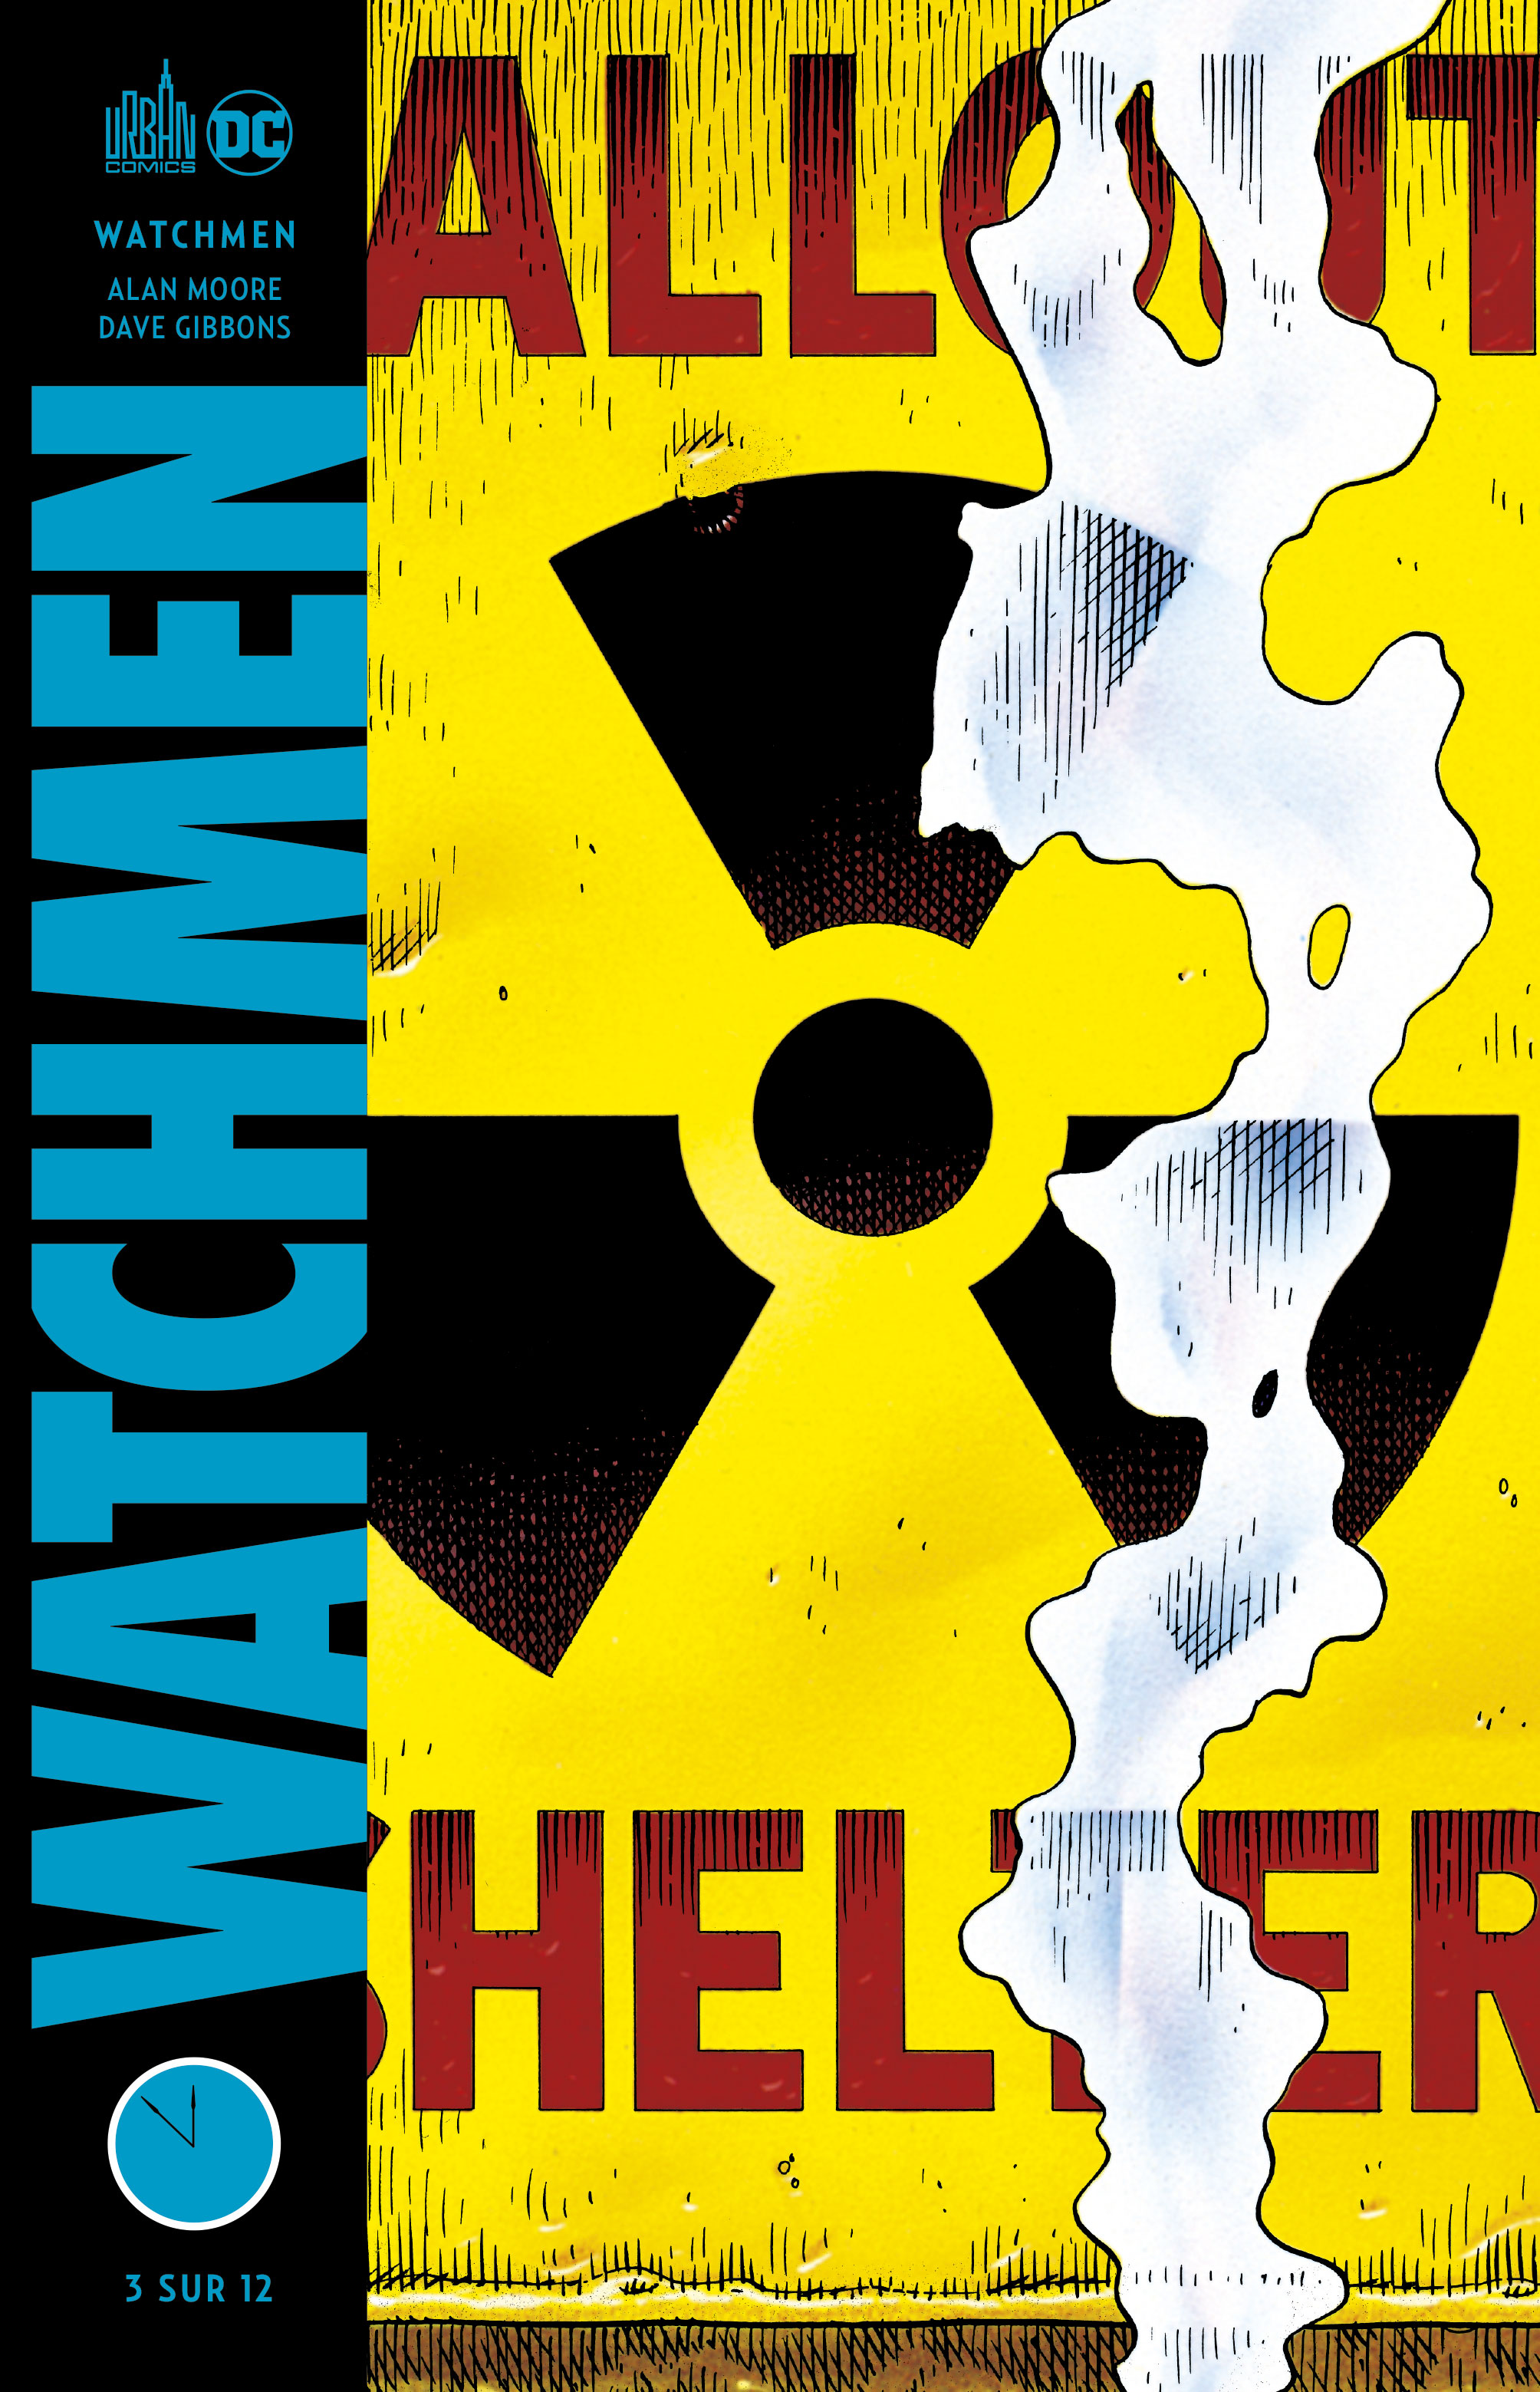 Watchmen - Les Gardiens 3